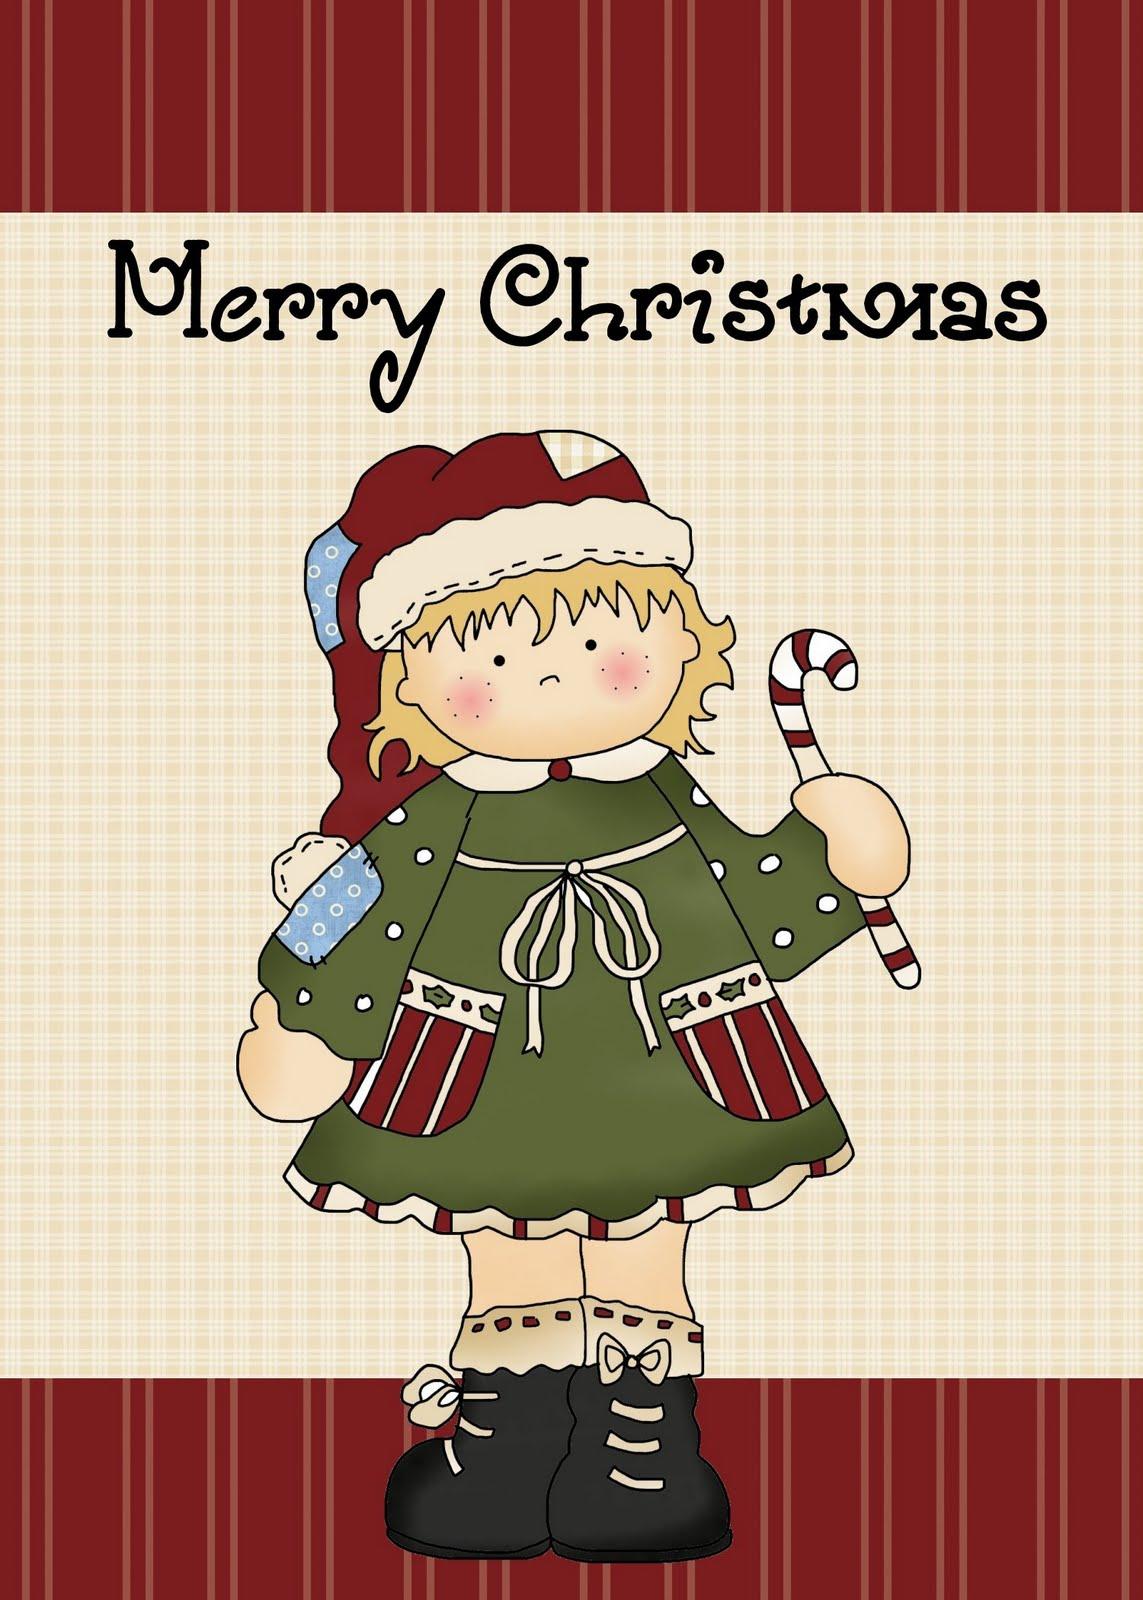 Scrapbookingbyleann Designs Free Printable Christmas Card